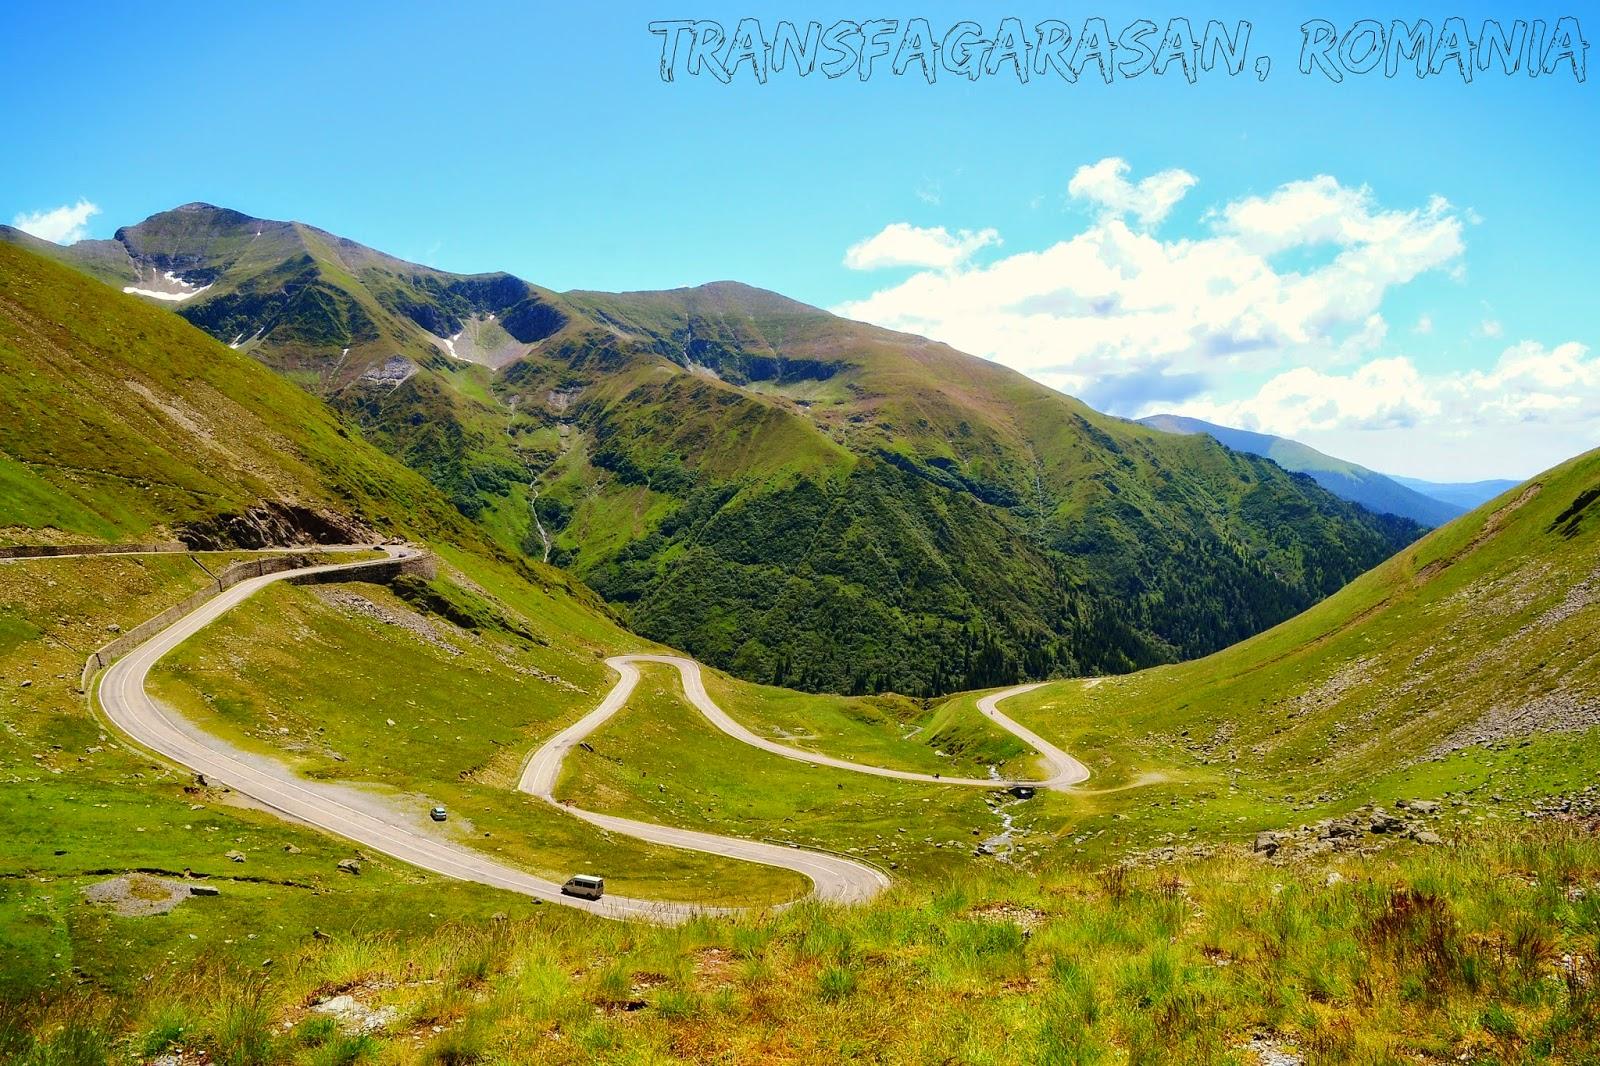 http://alittlefashionsparkle.blogspot.ro/2014/07/road-trip-part-1-mountains.html